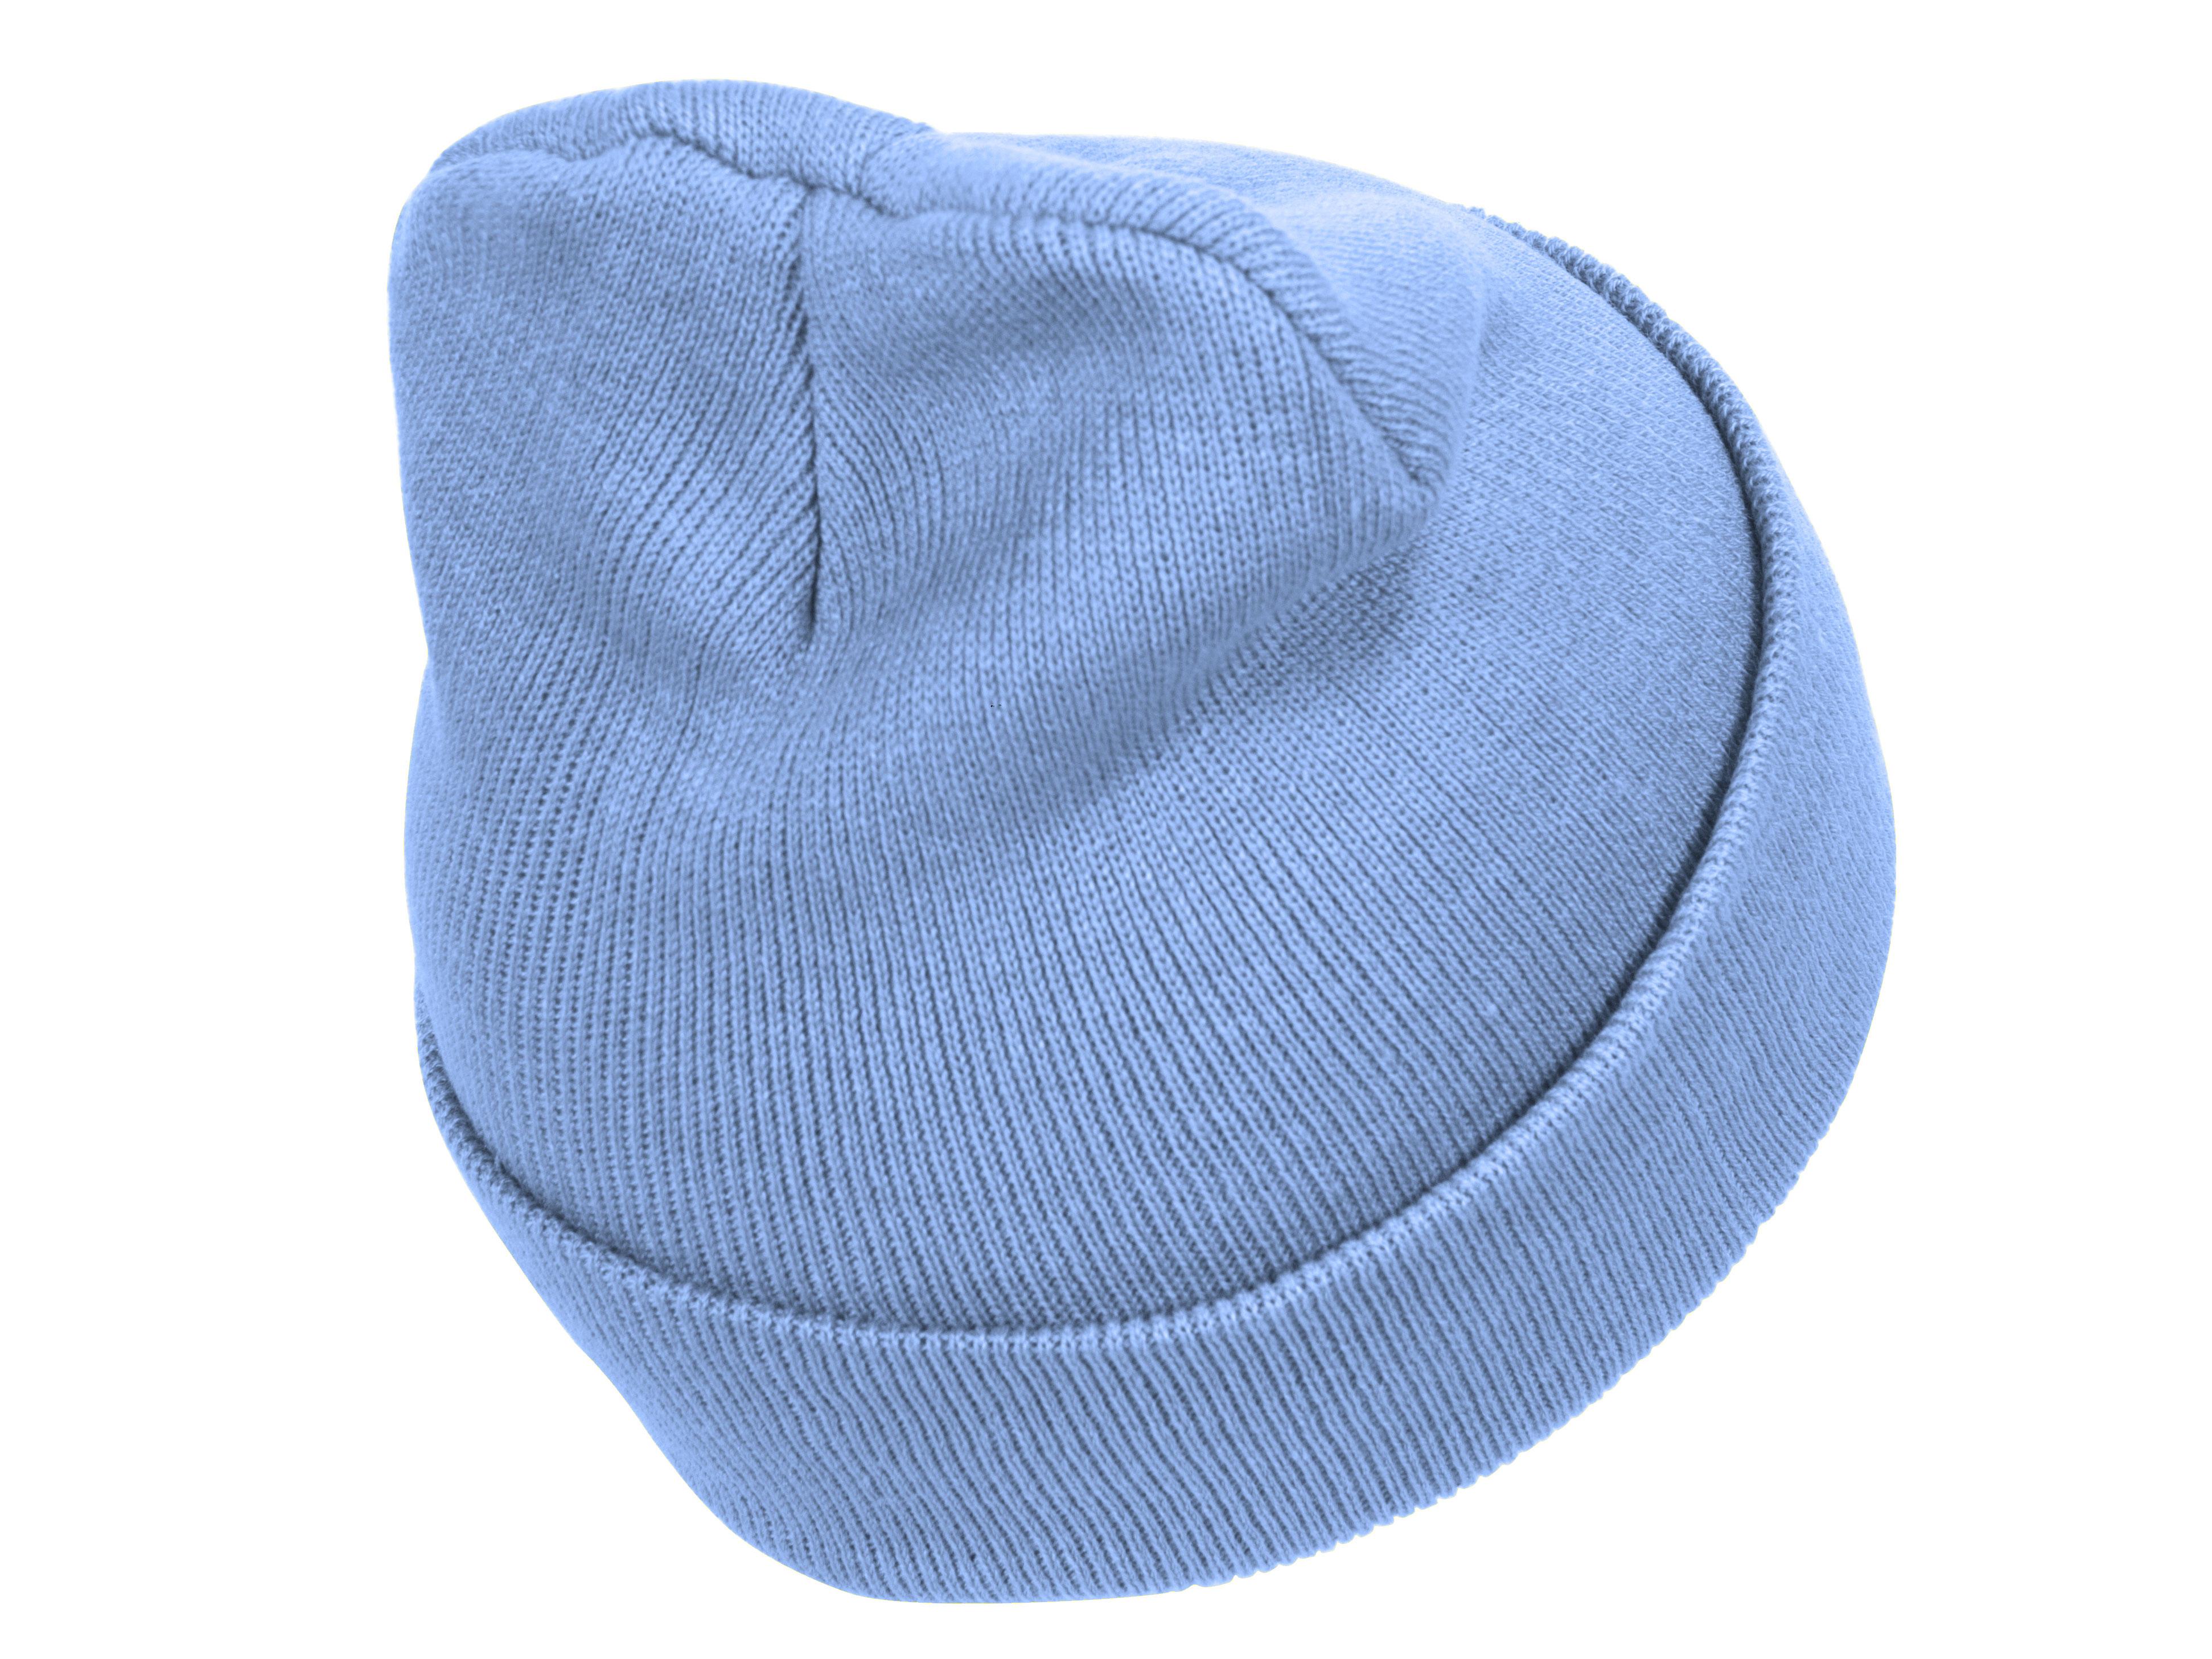 thumbnail 82 - Top Headwear Solid Winter Long Beanie - 12 Piece Wholesale